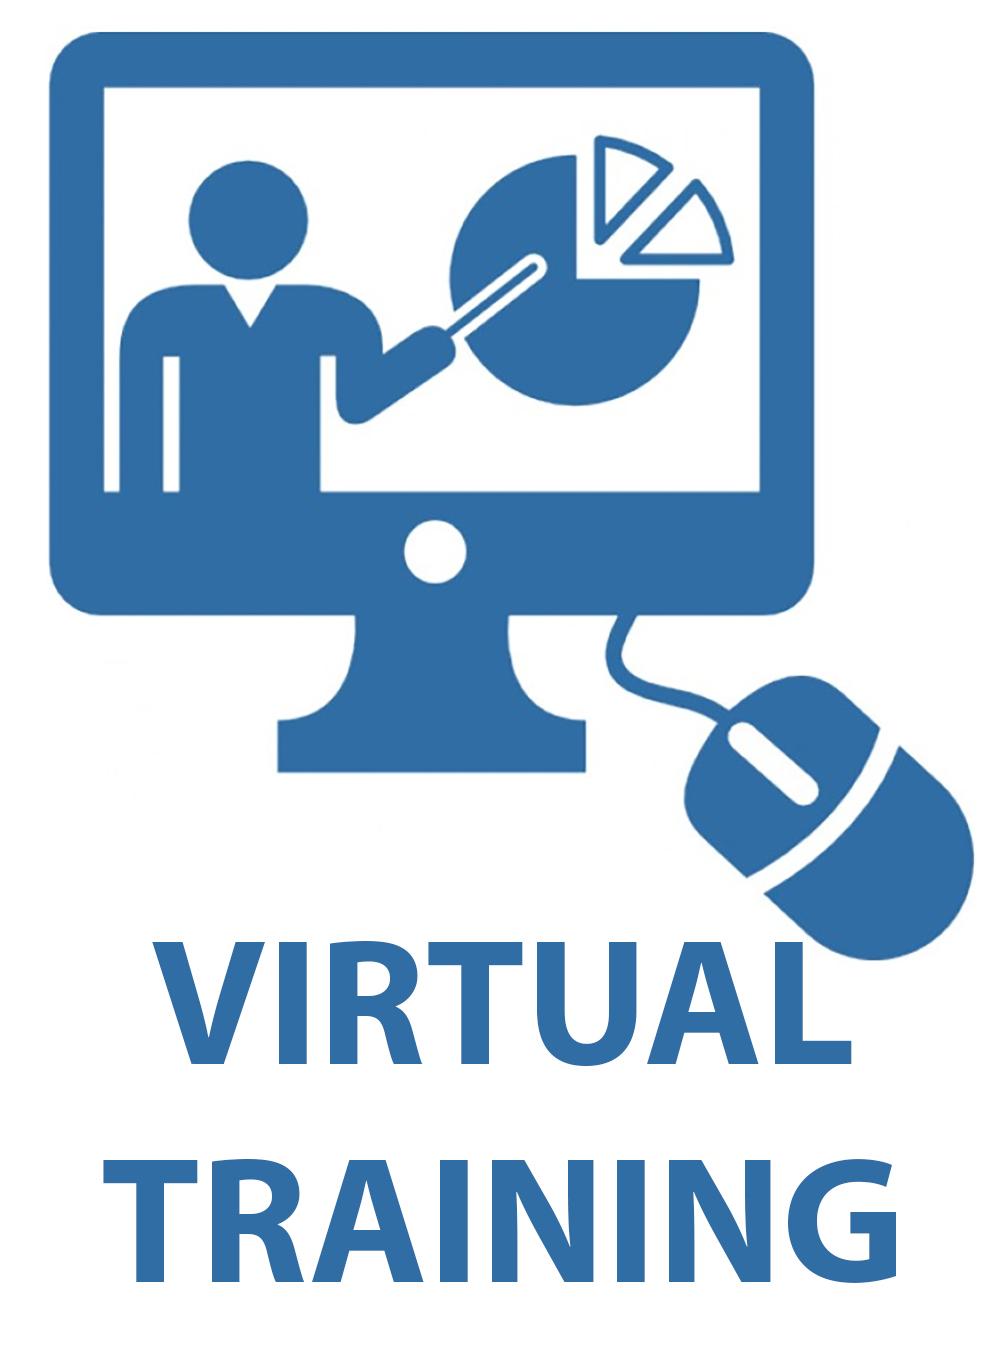 Virtual Training: Internal Controls for Tribal Programs Training October 13-16, 2020